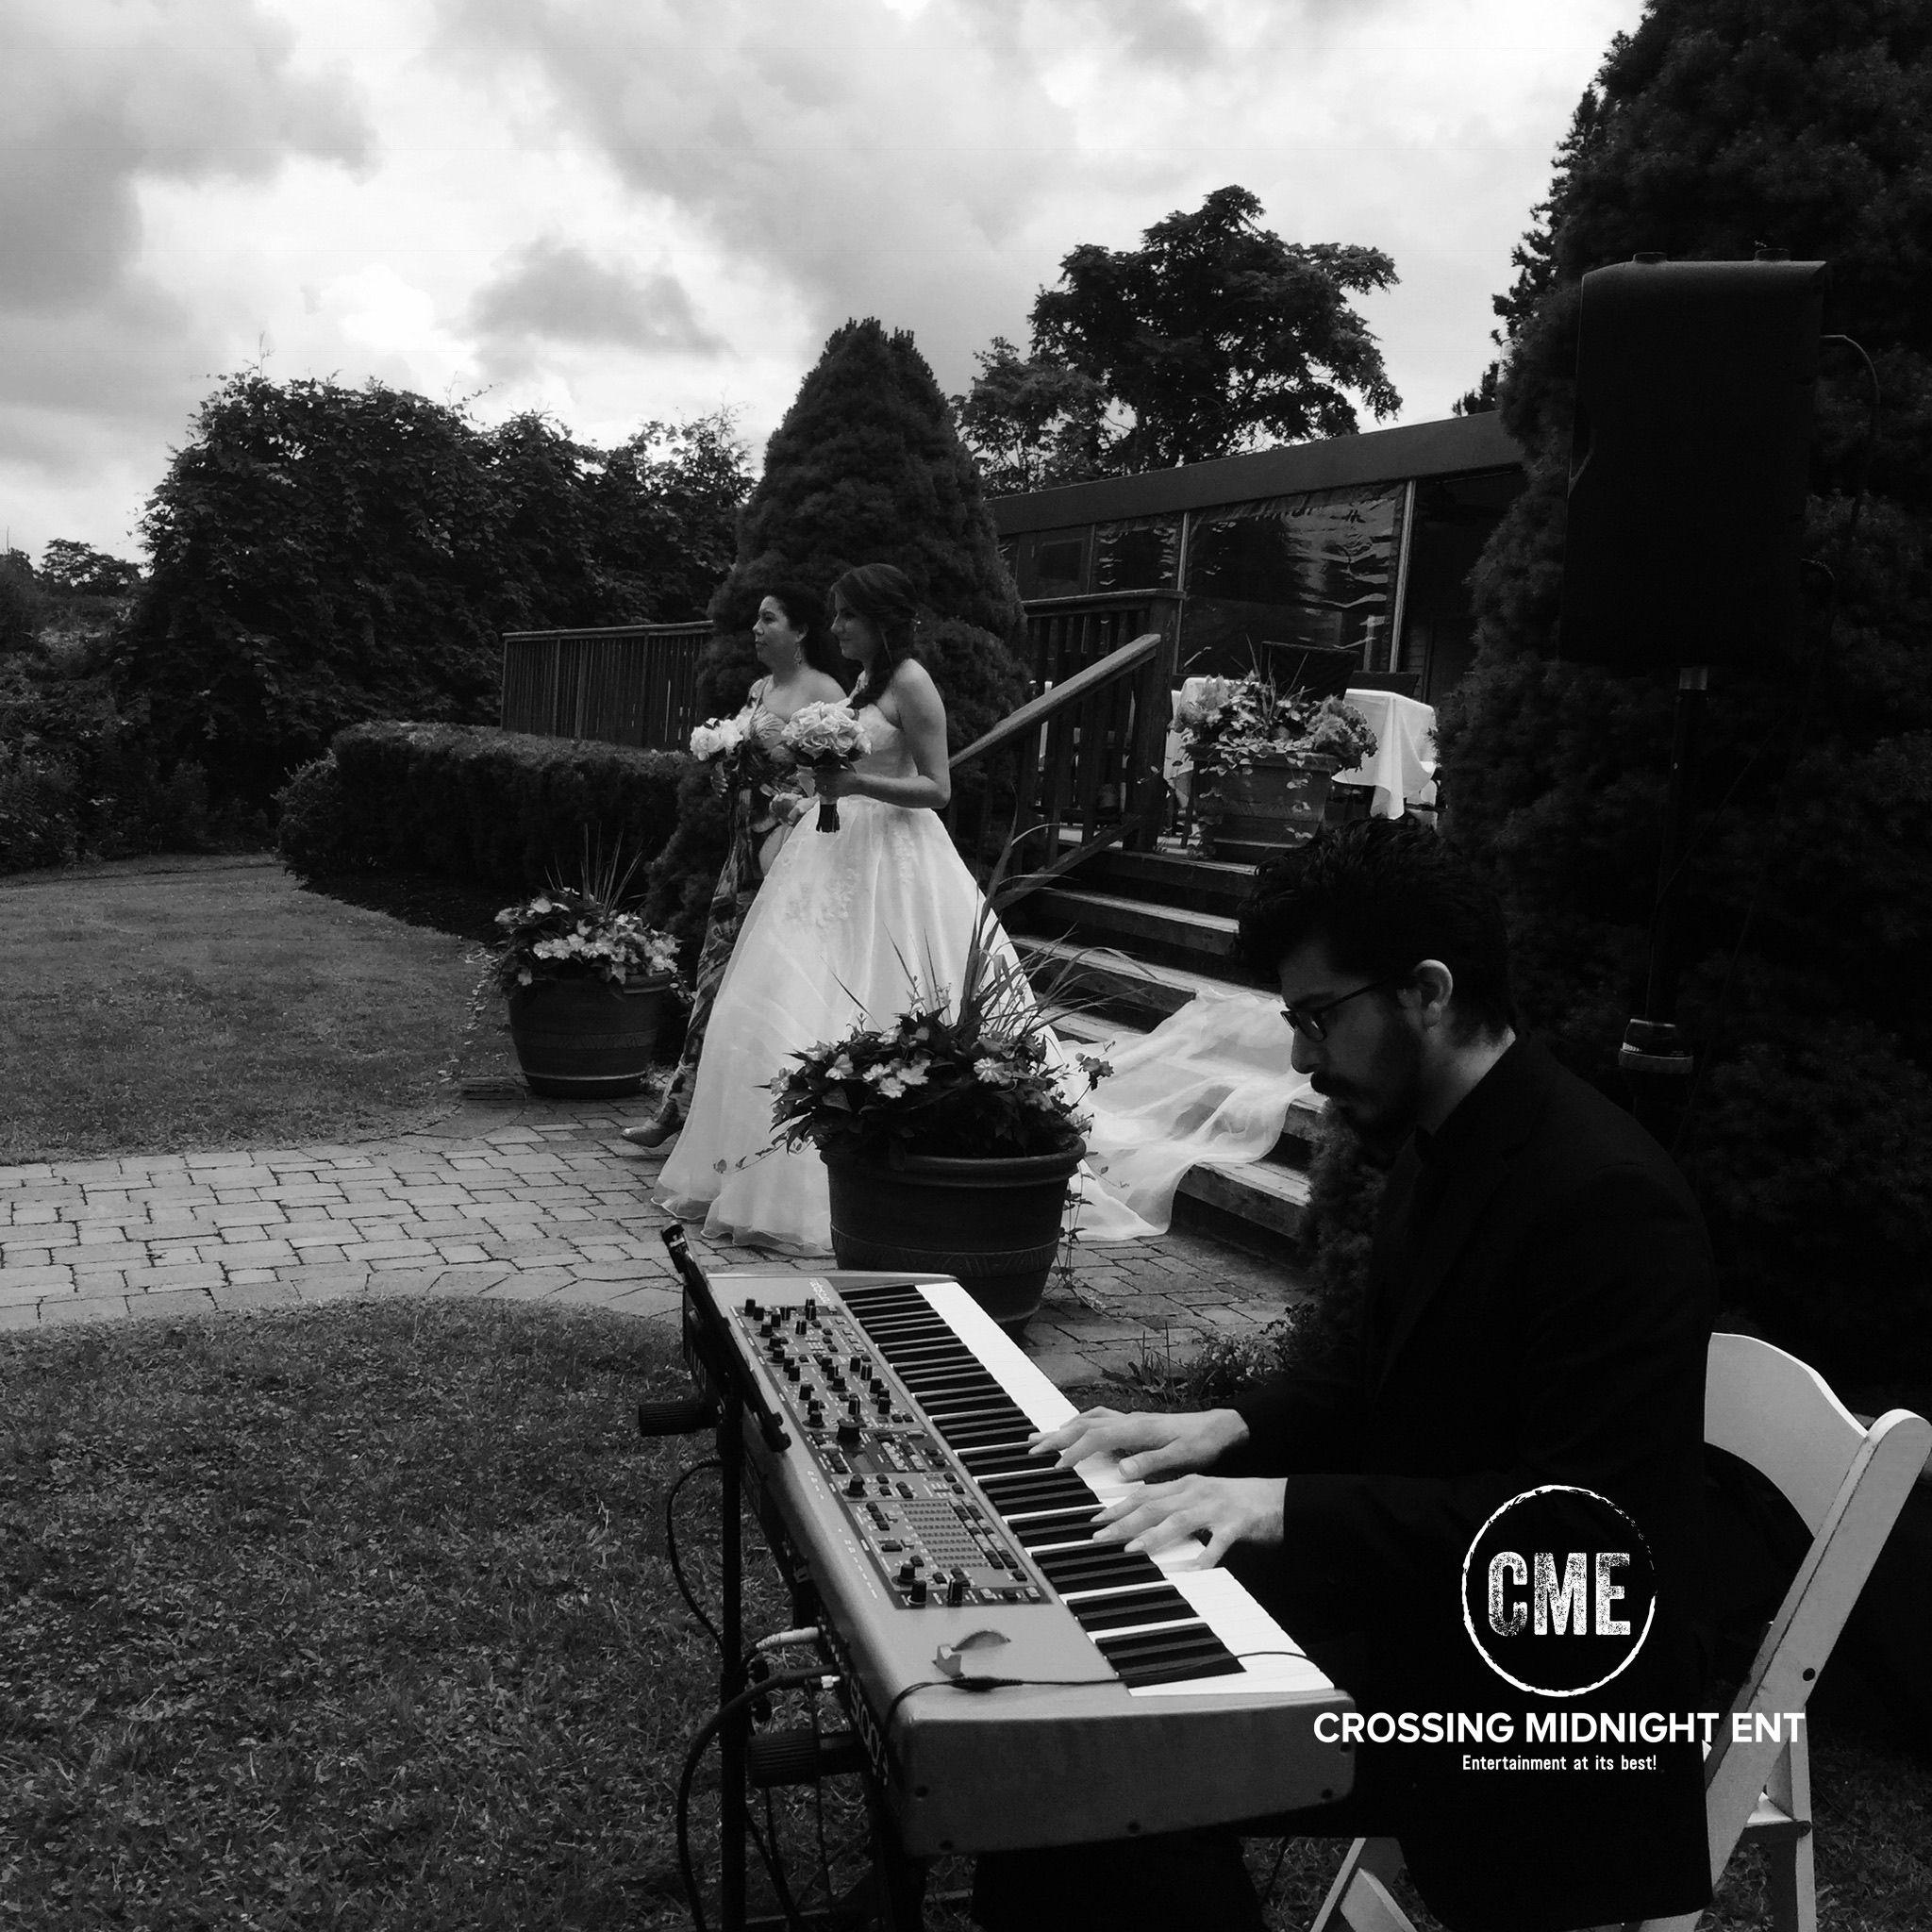 Wedding, Concert, Reception